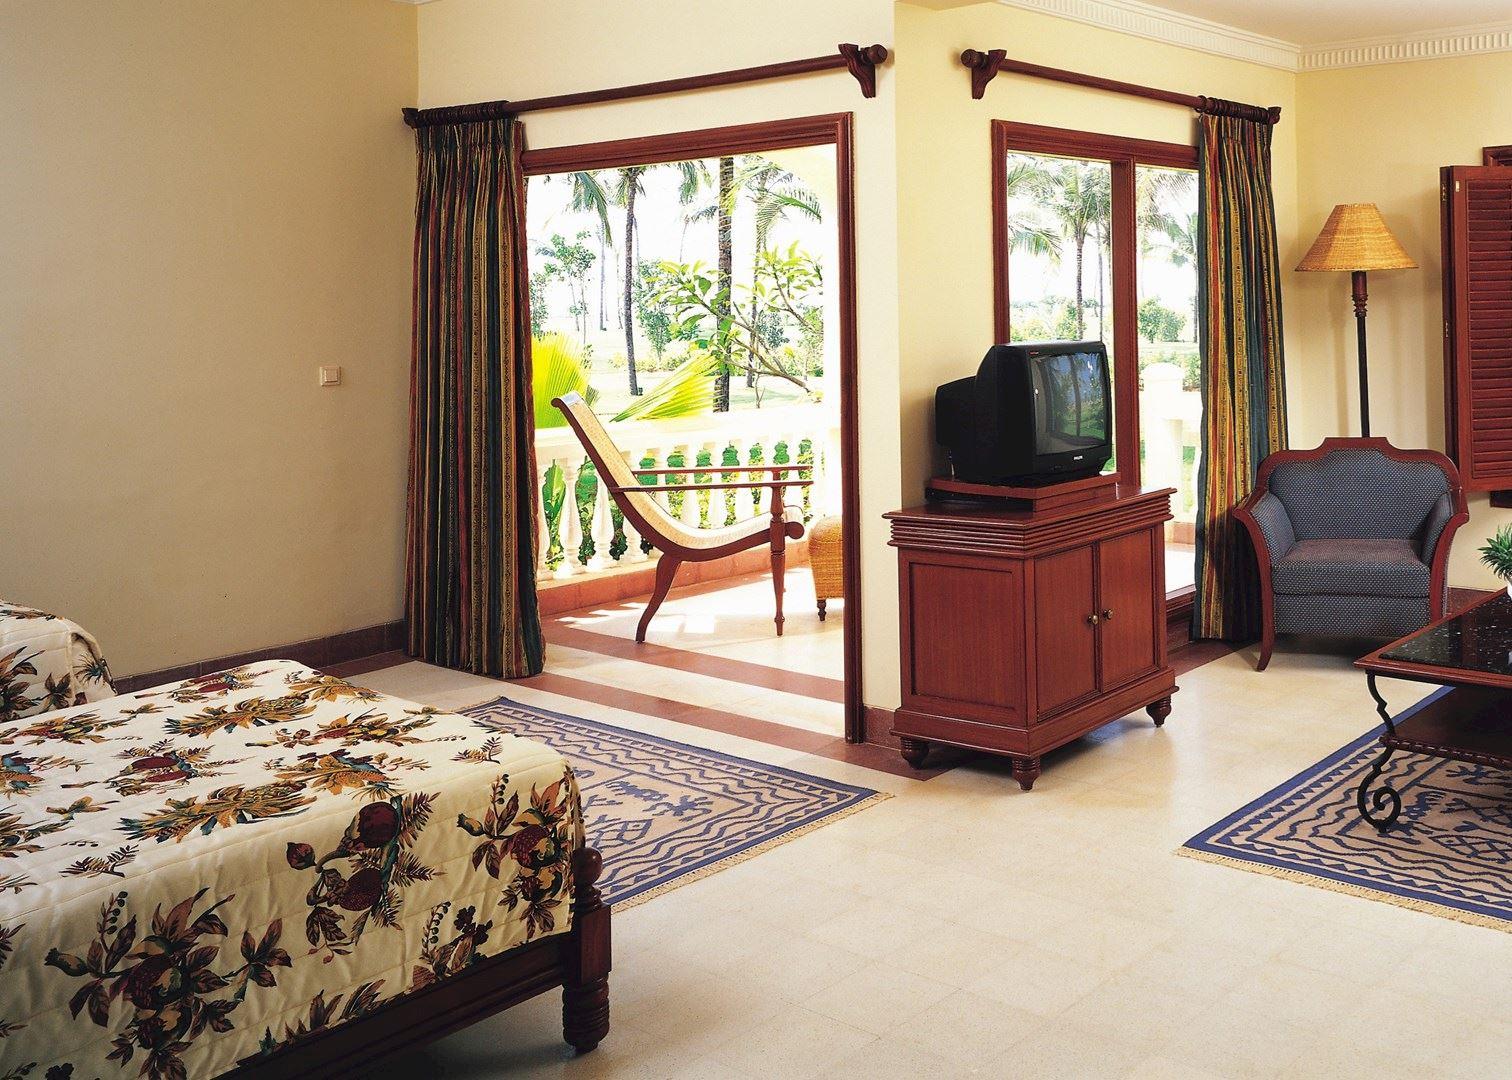 Taj Exotica Hotels In Goa Audley Travel